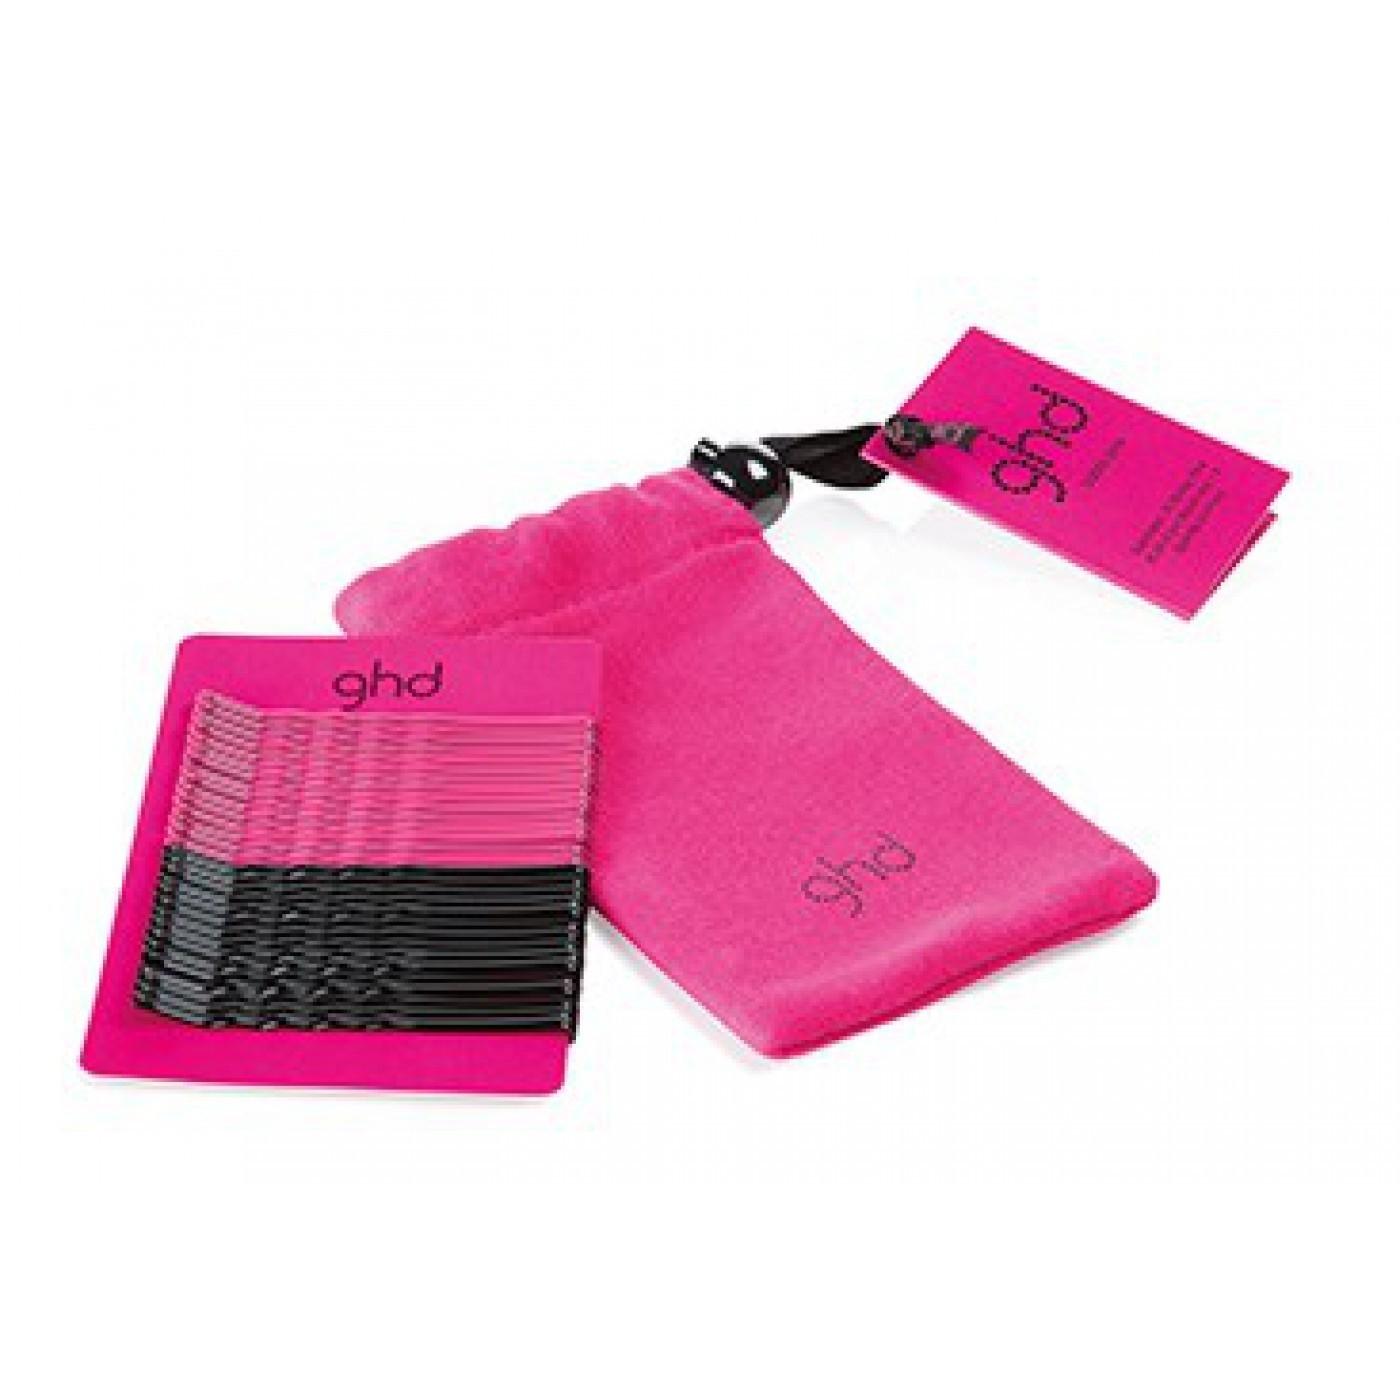 ghd Electric Pink Bobby Pin Bag (Inhalt 30 Stück)